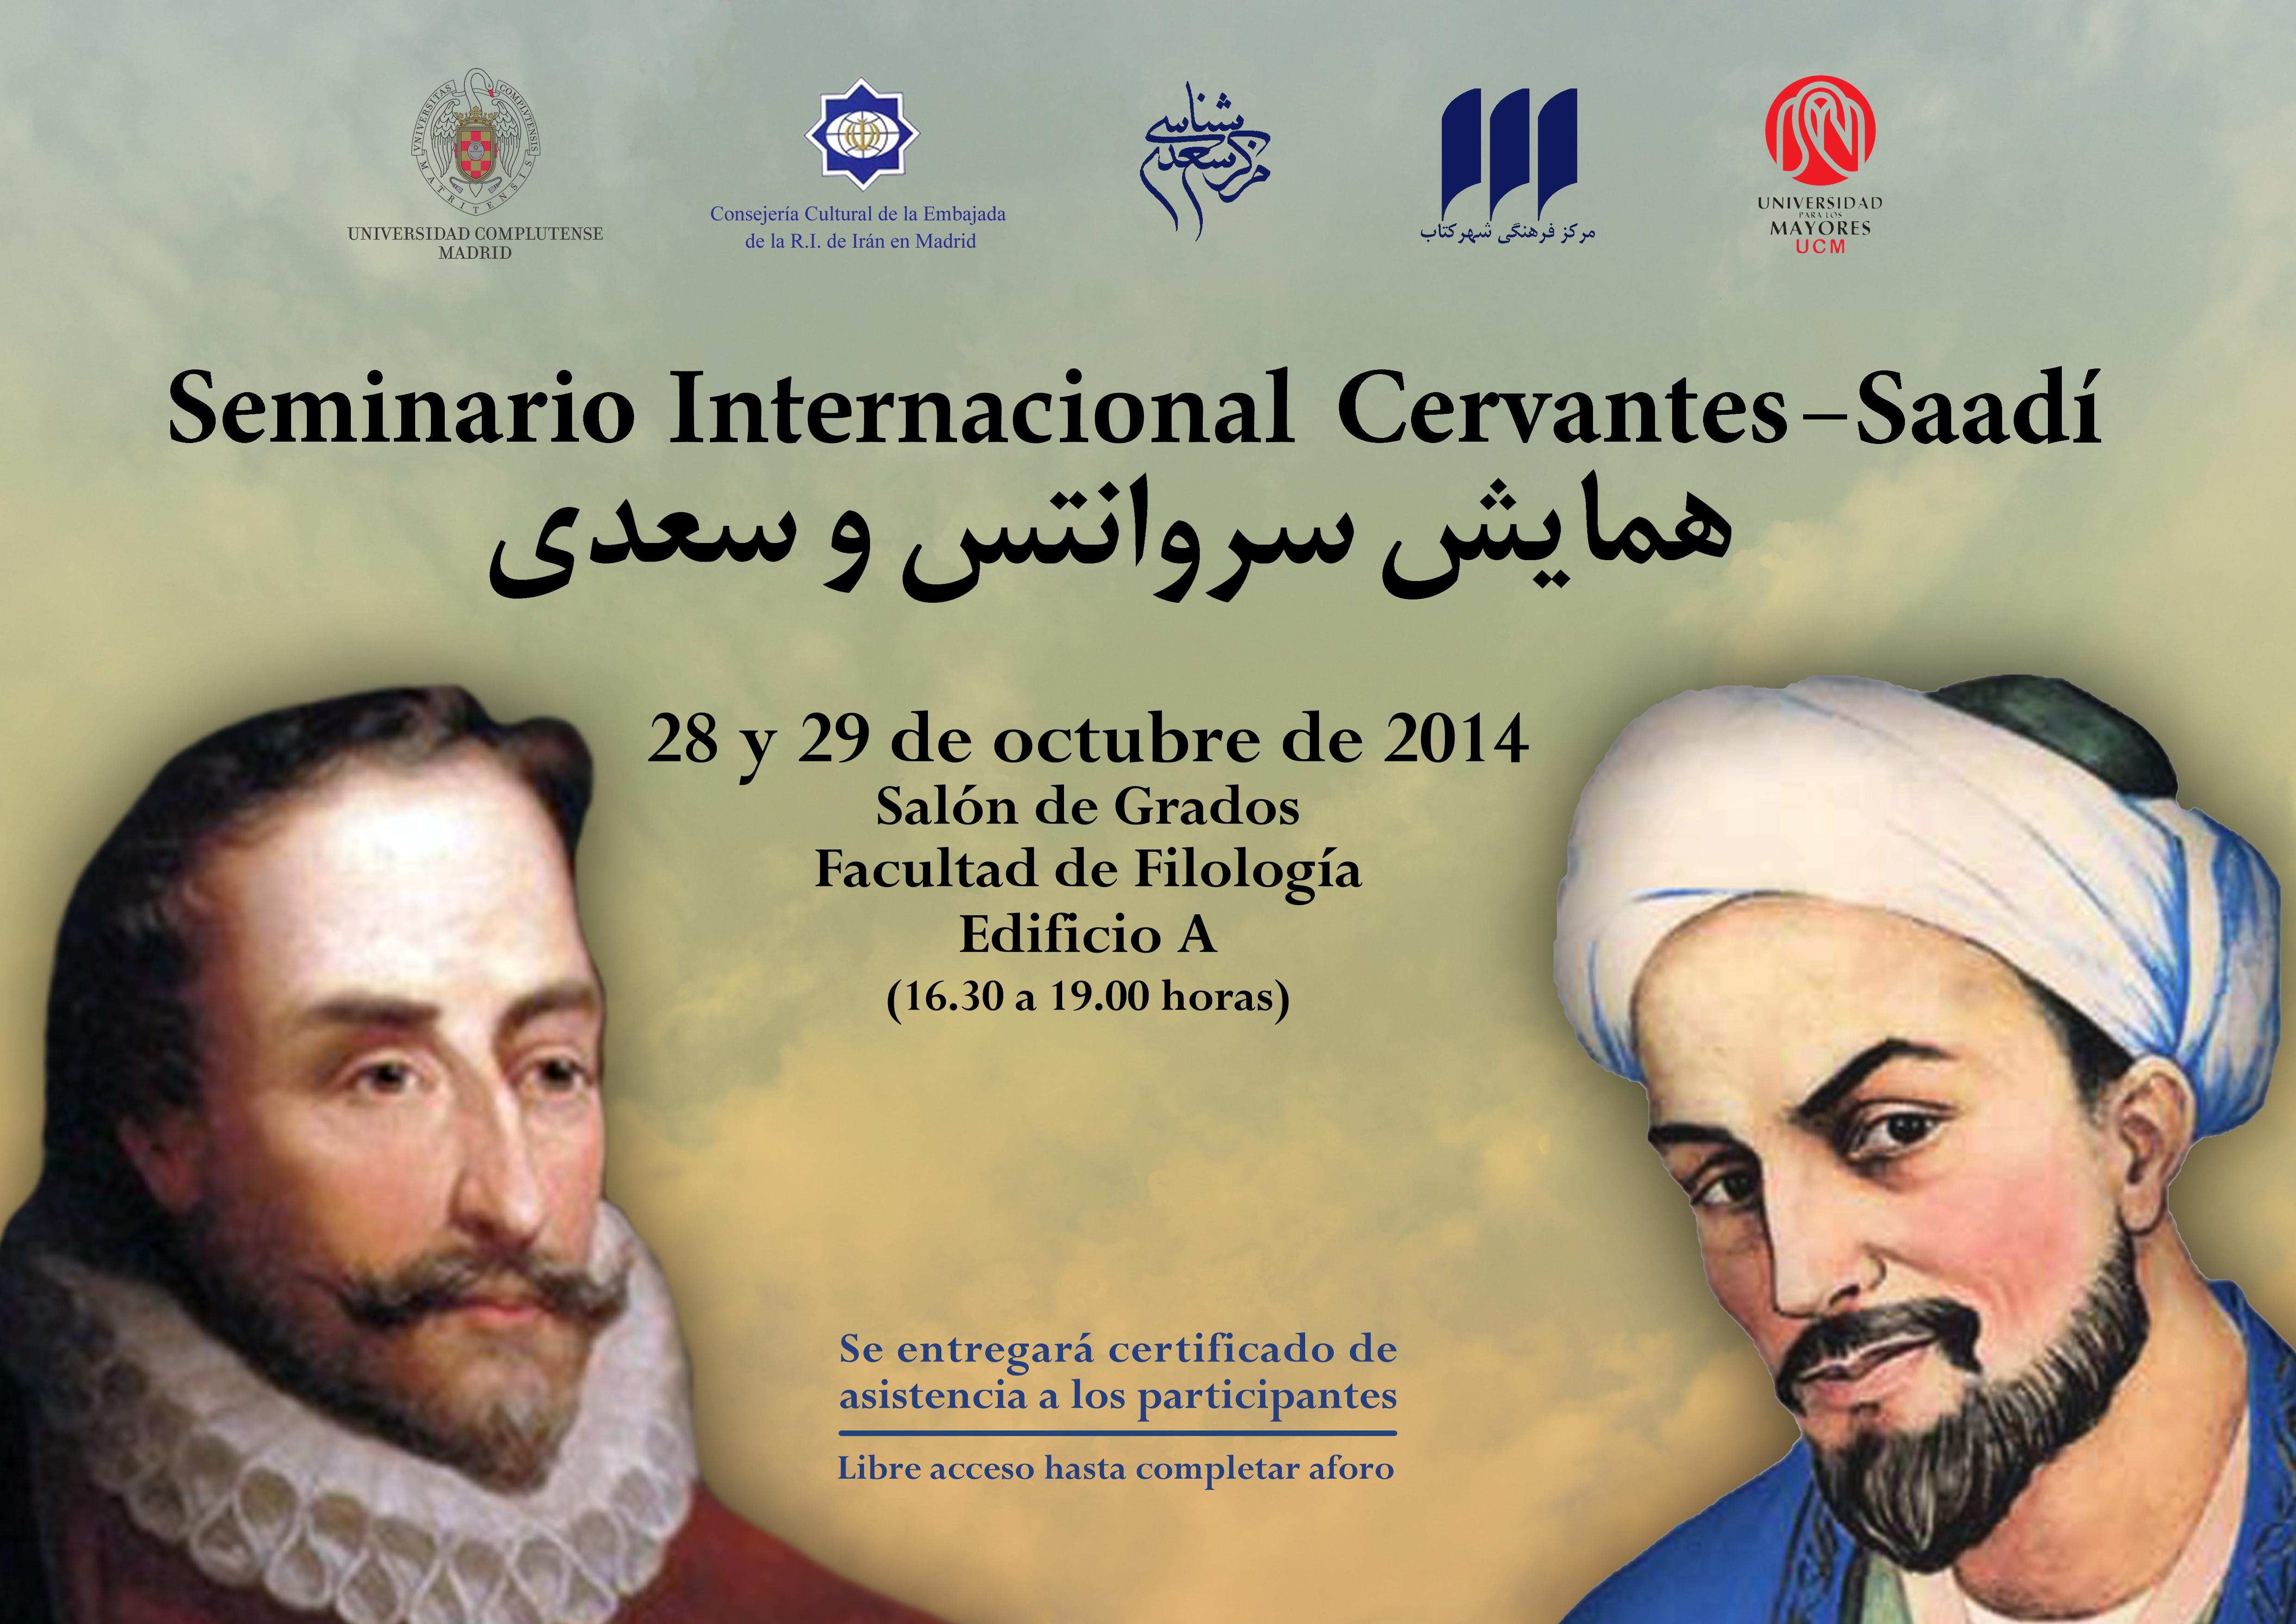 poster seminario cervantes-saadi (1)